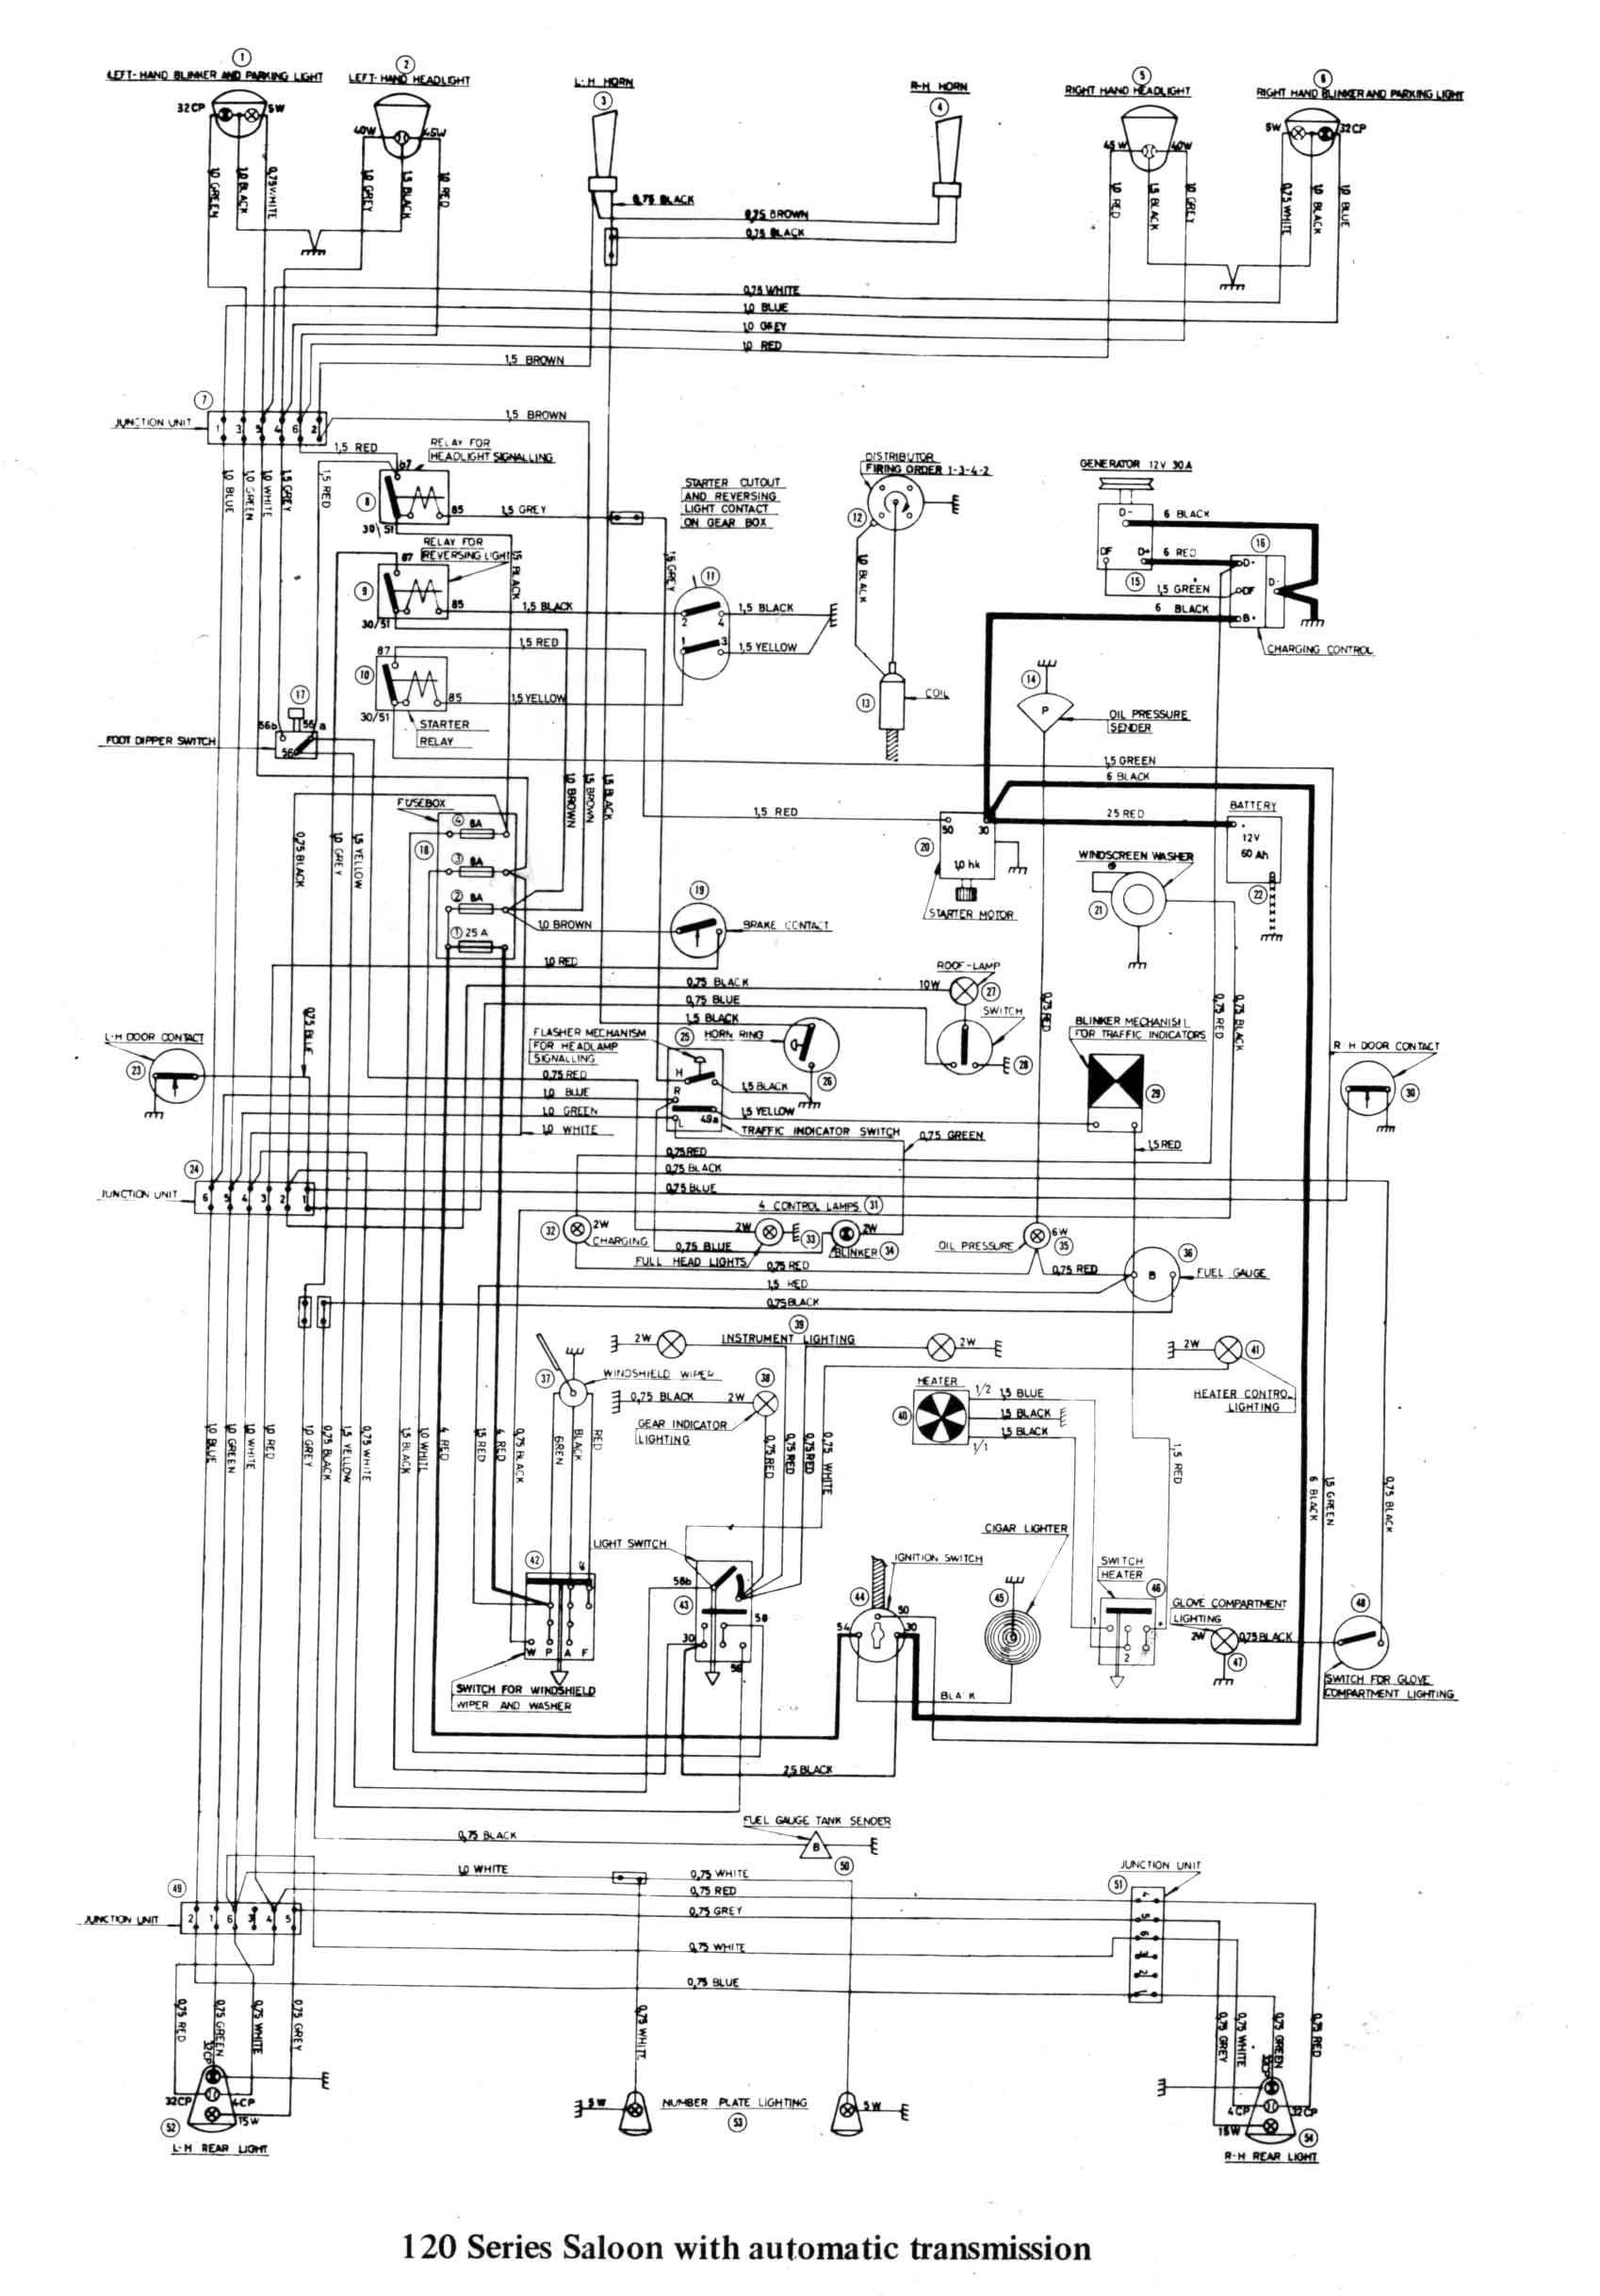 Man Truck Electrical Wiring Diagram Sw Em Od Retrofitting Vintage Volvo Refer Wiring Diagram 122s Showy Of Man Truck Electrical Wiring Diagram